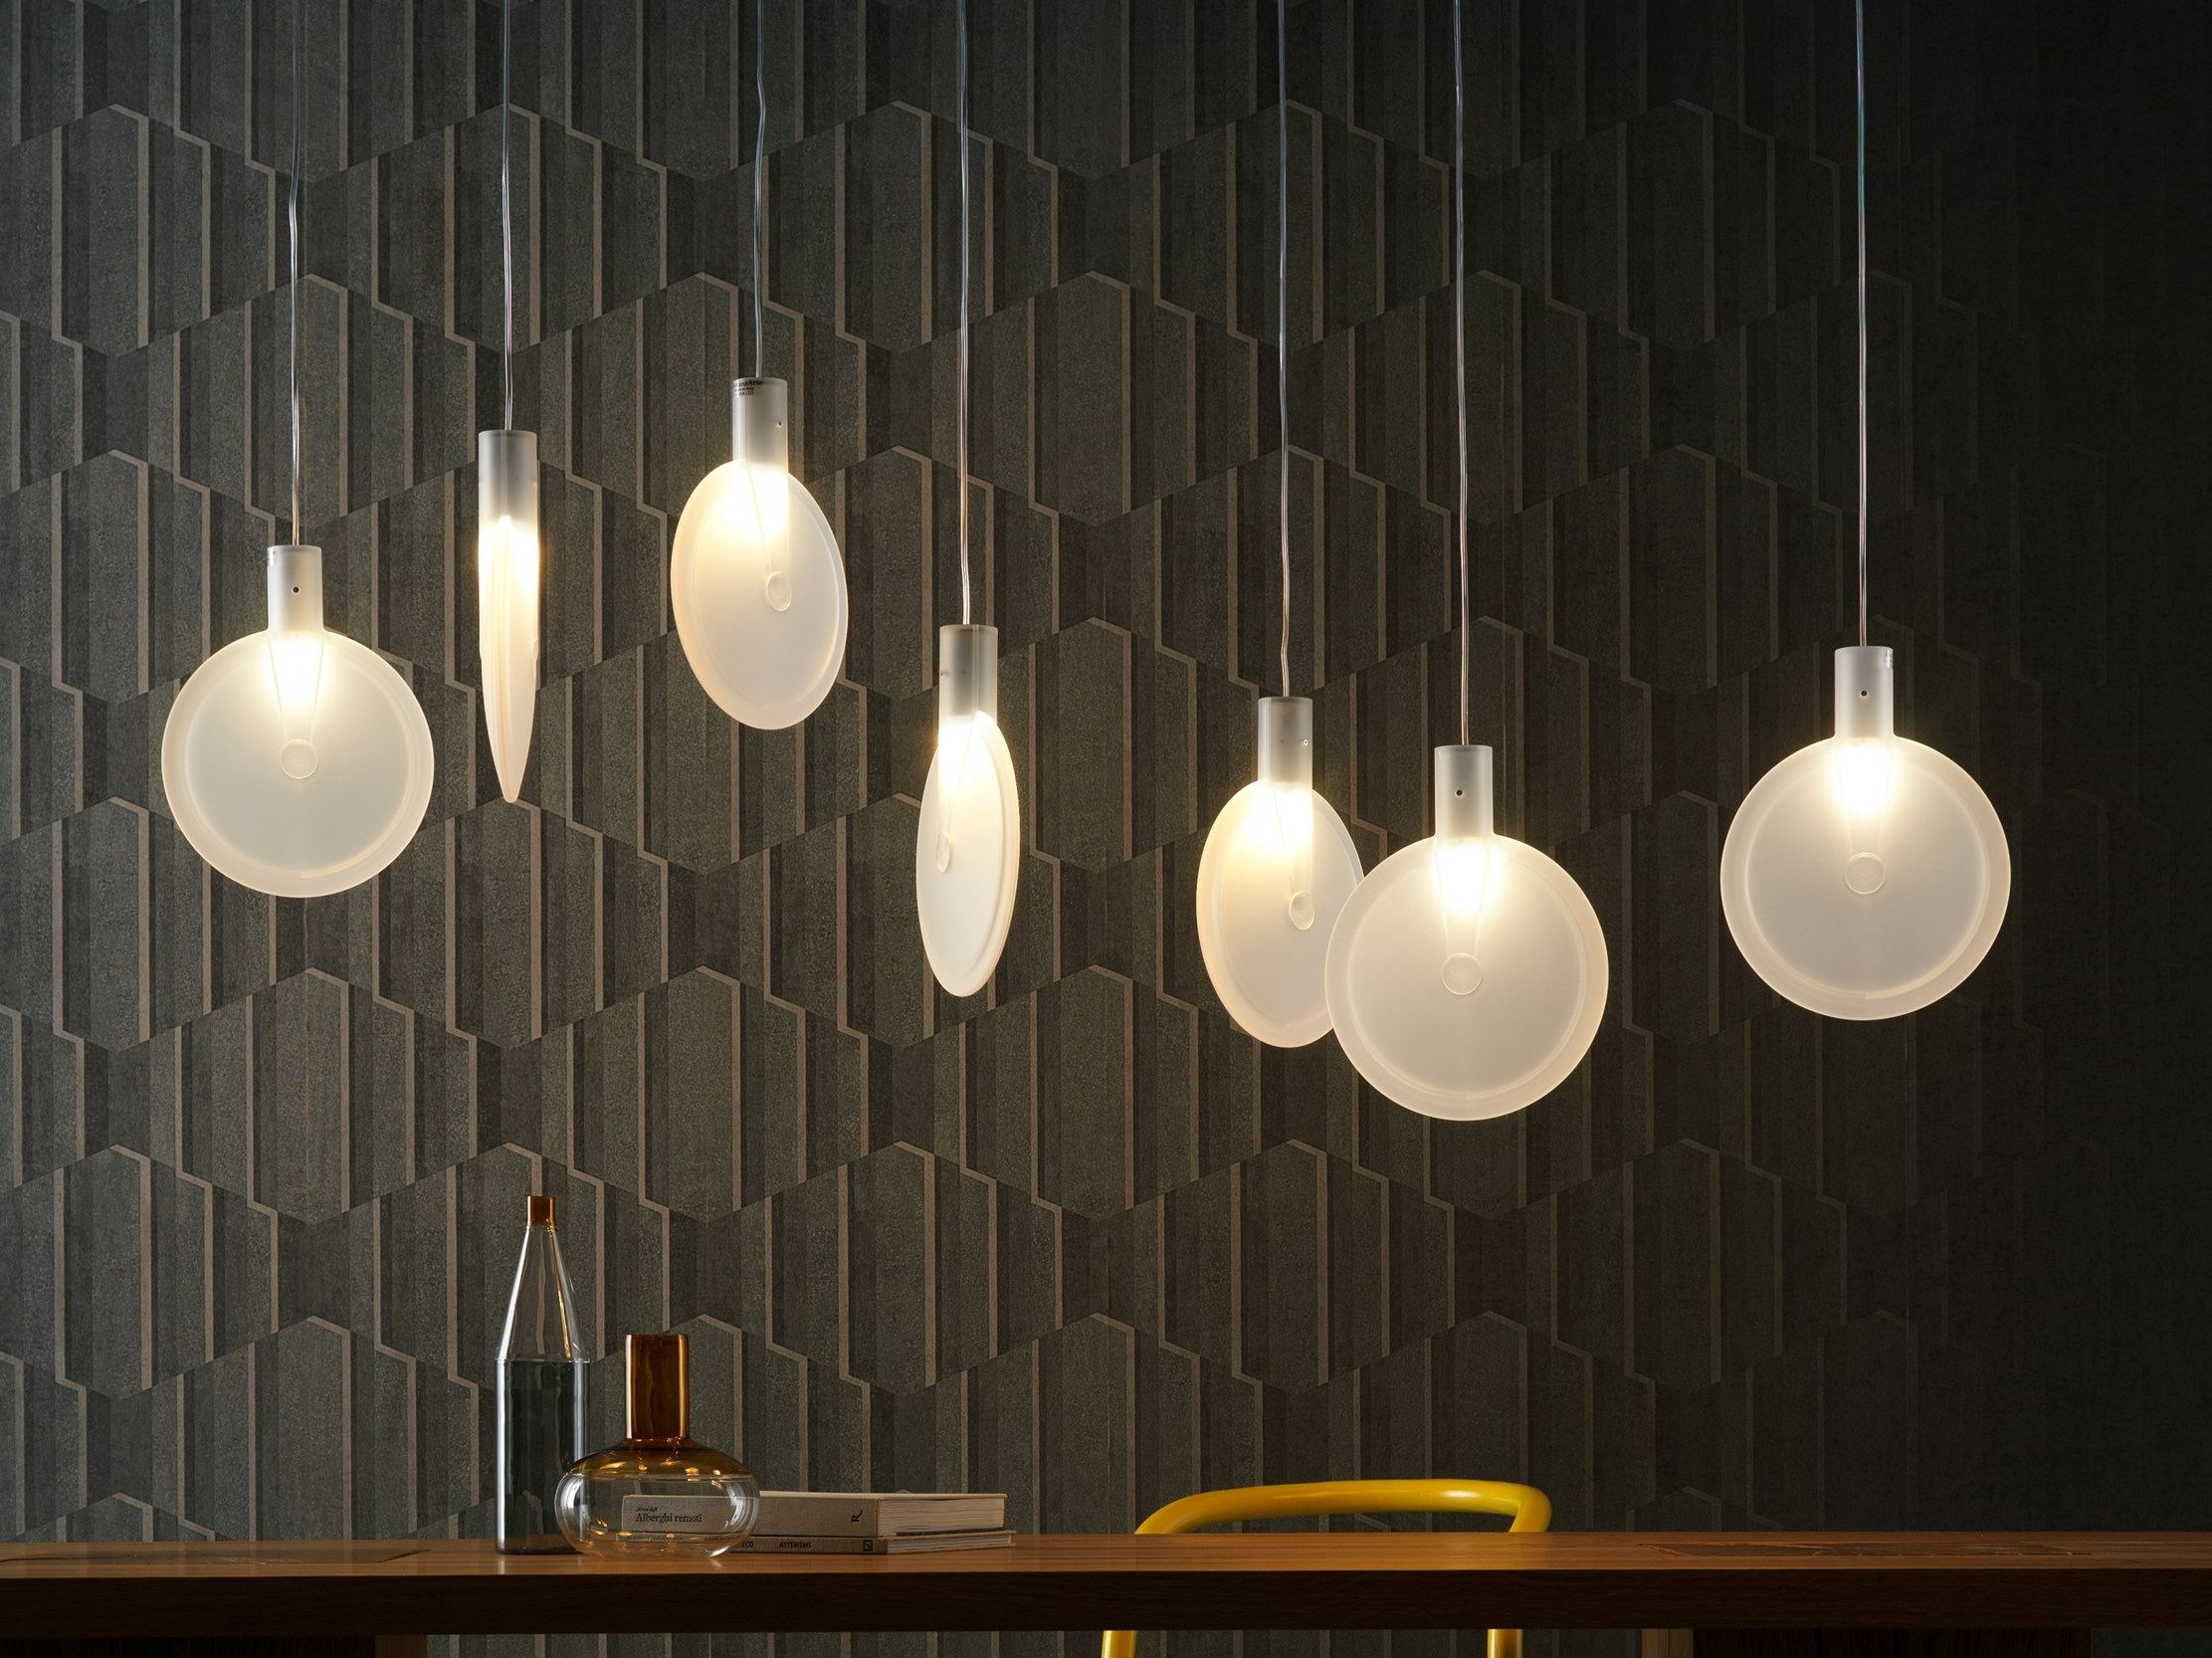 Lampade A Sospensione Led : Lampade sospensione led lampade a sospensione in vetro